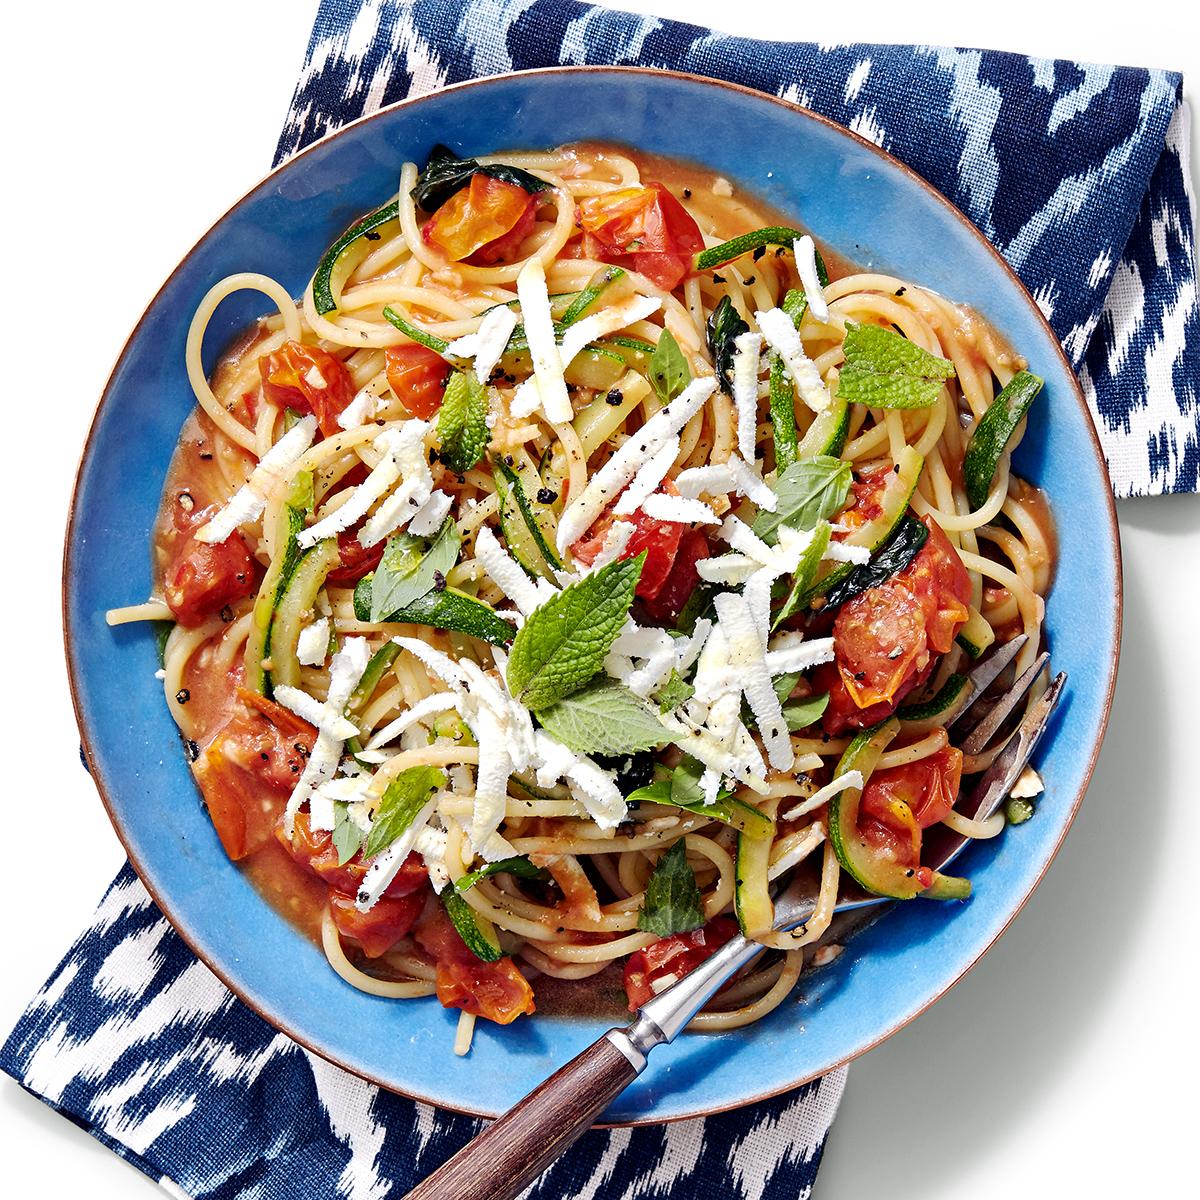 spaghetti with zucchini cherry tomato sauce and ricotta salata